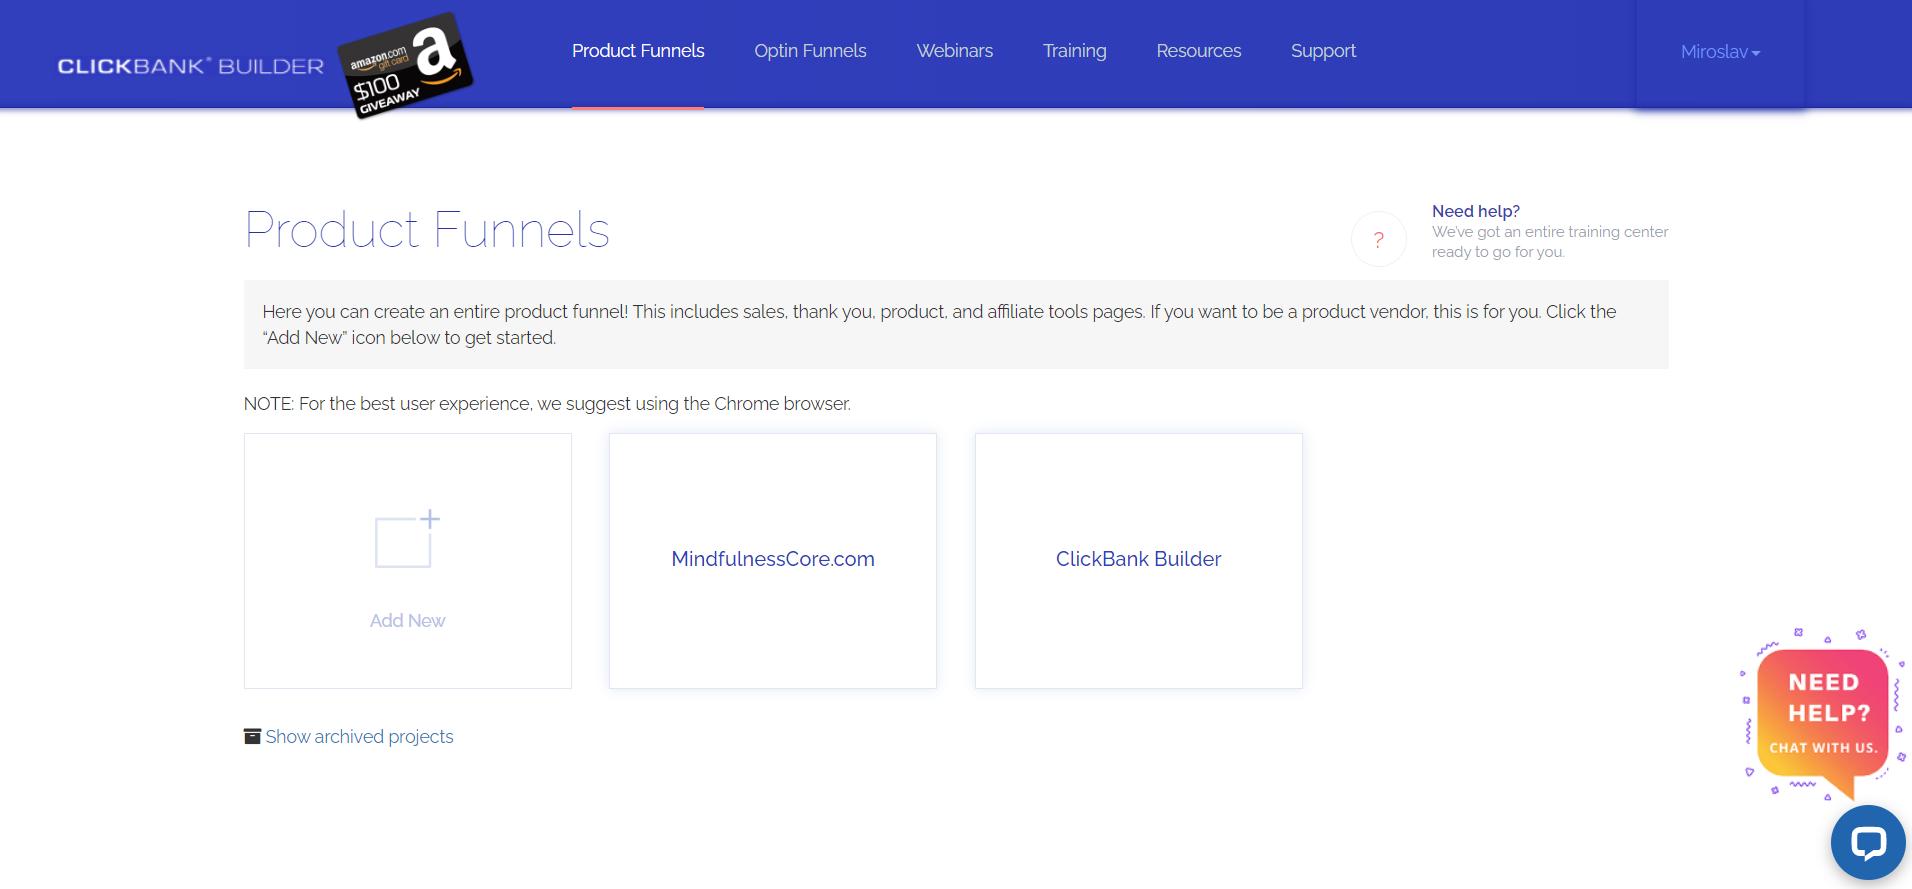 ClickBank Builder Product Funnels software